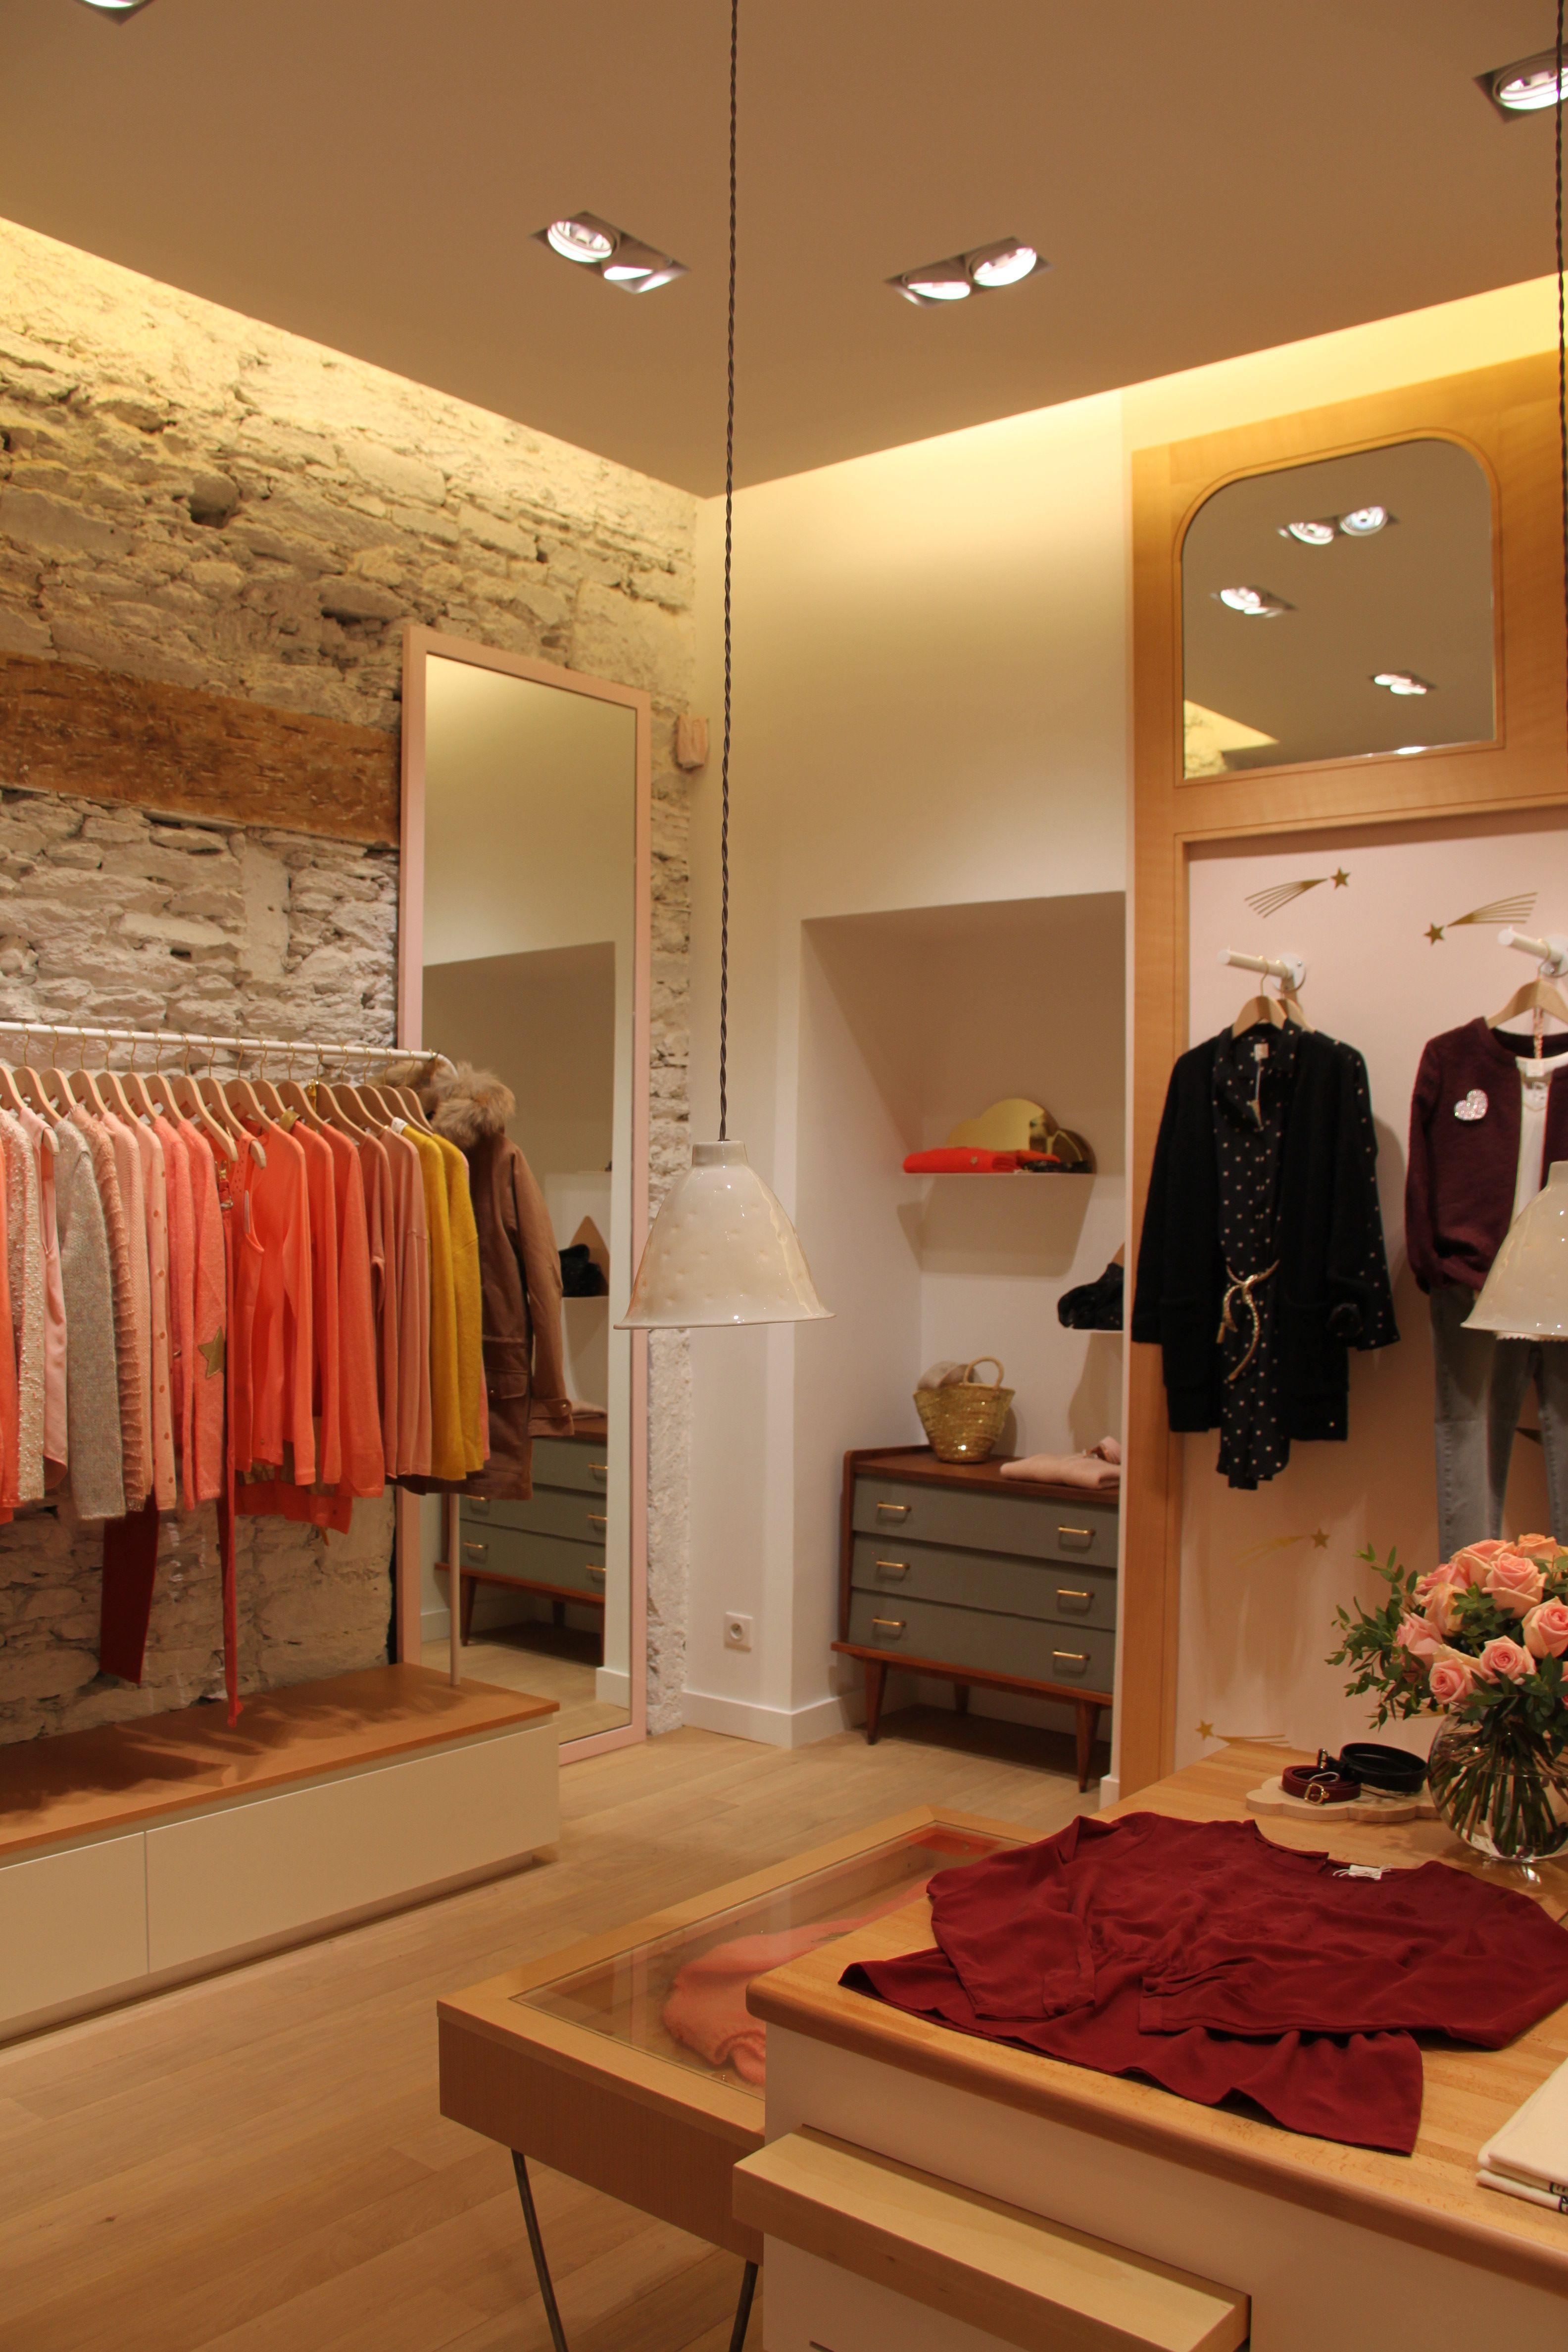 la boutique des petits hauts de nantes loja de roupa locais inspiracao